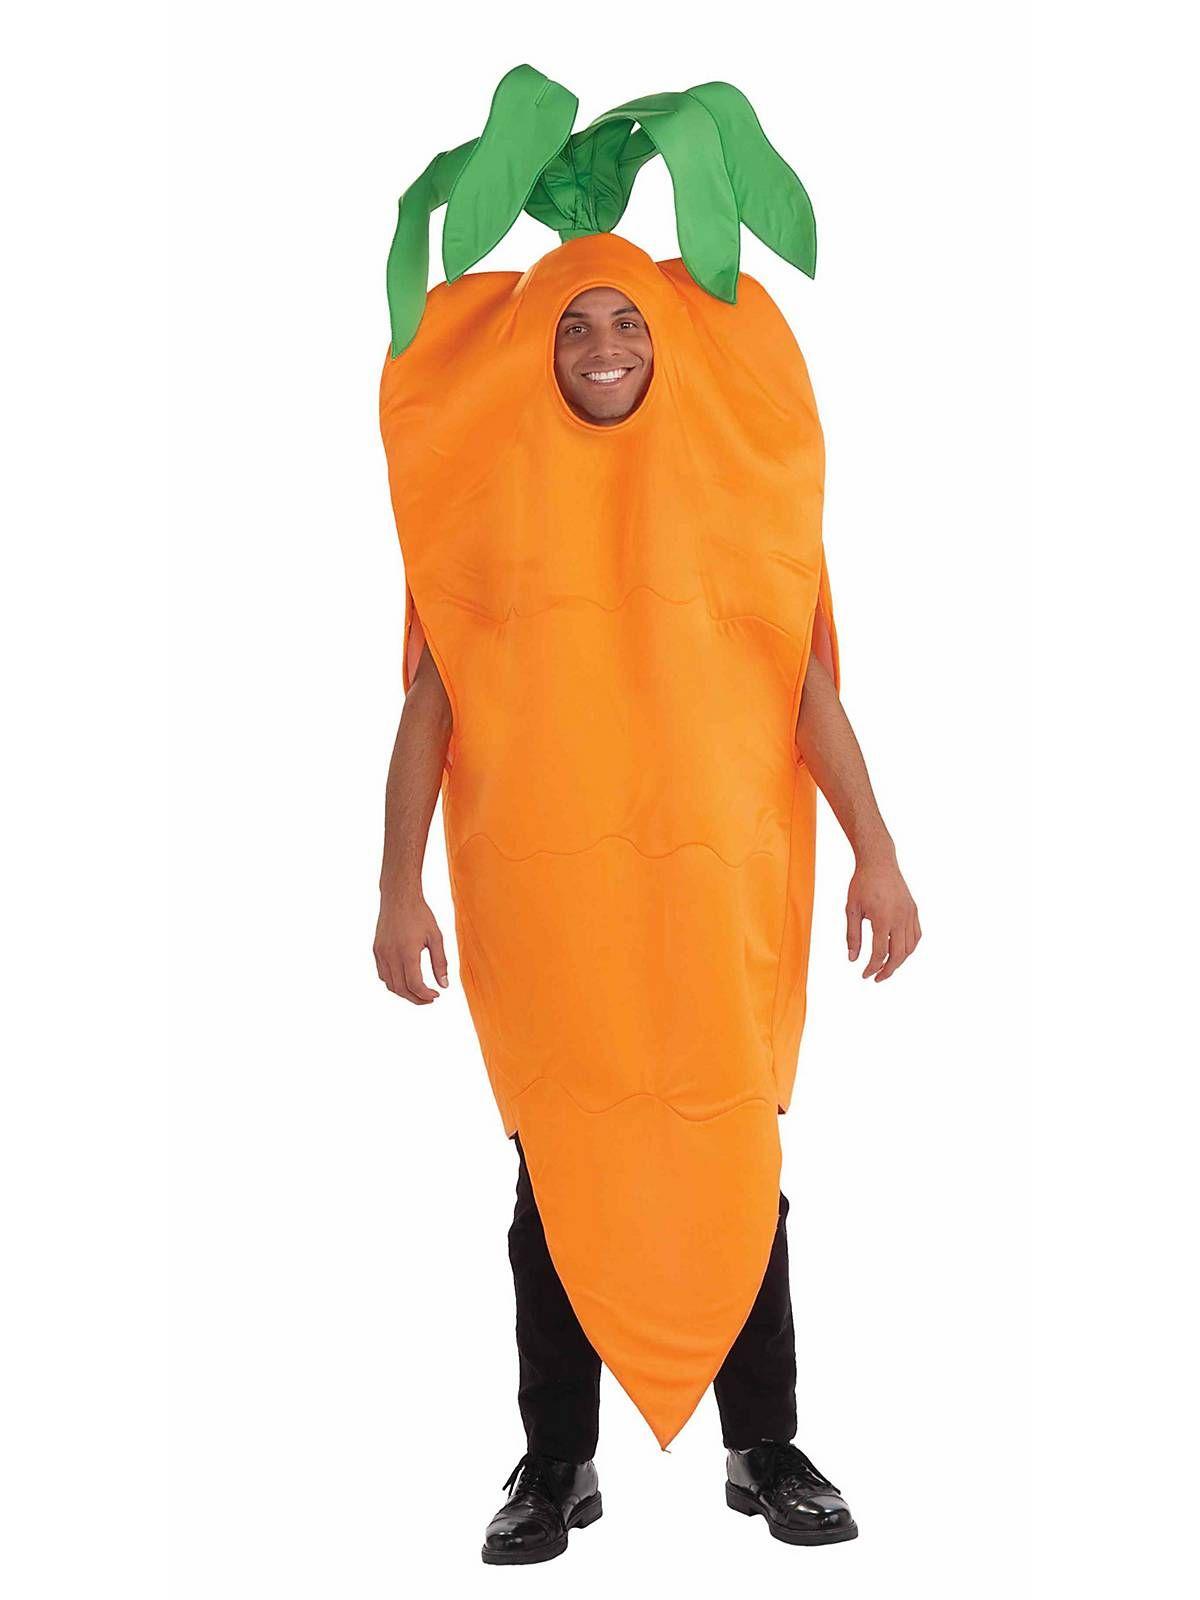 Eggplant Adults Costume Size STD